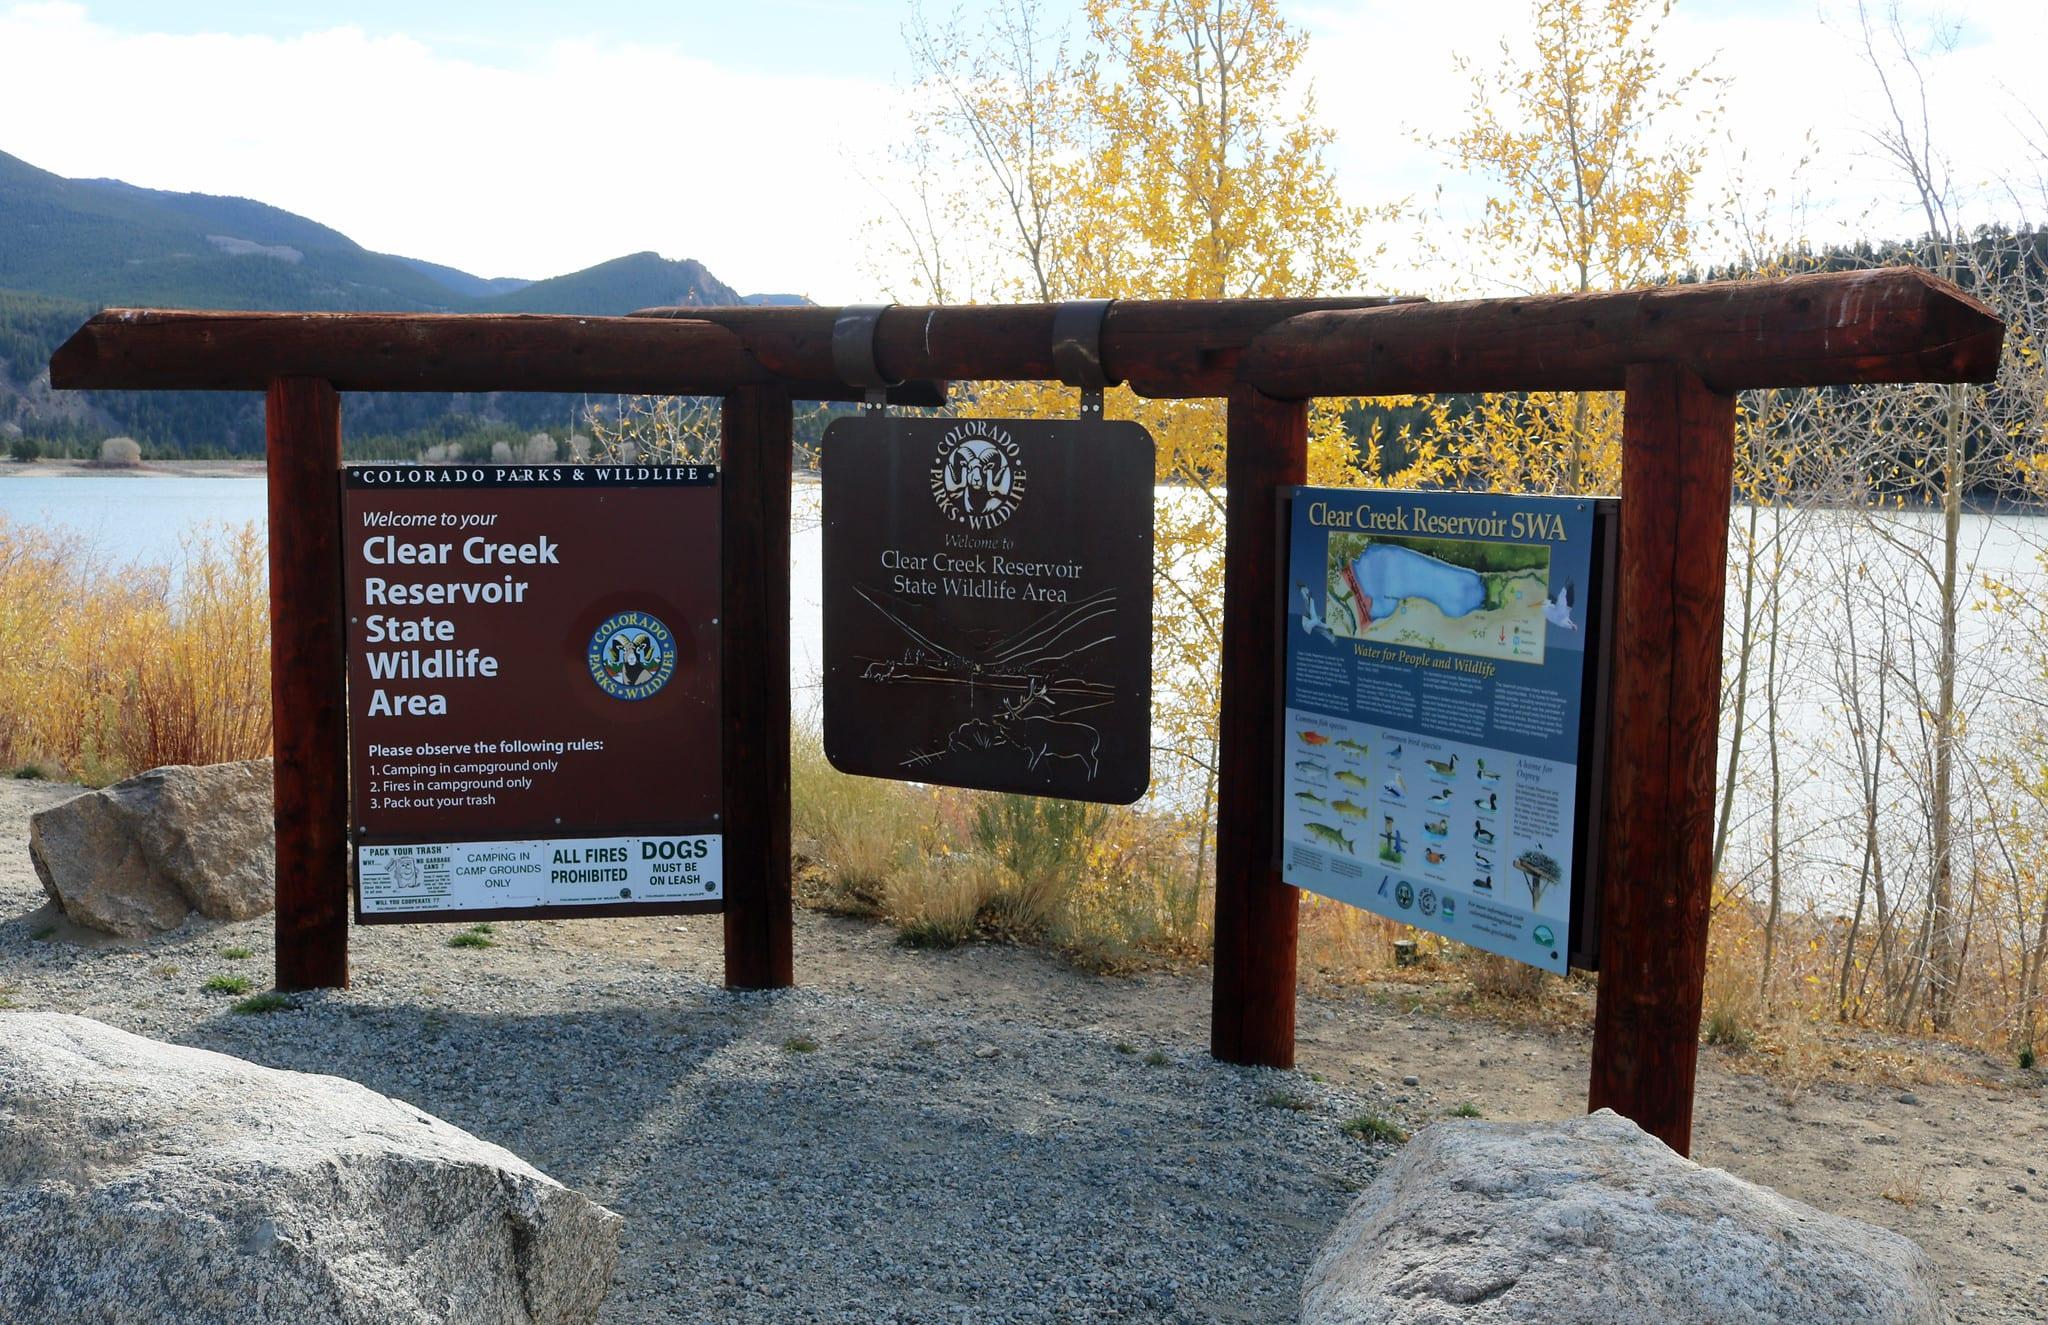 image of Clear Creek Reservoir